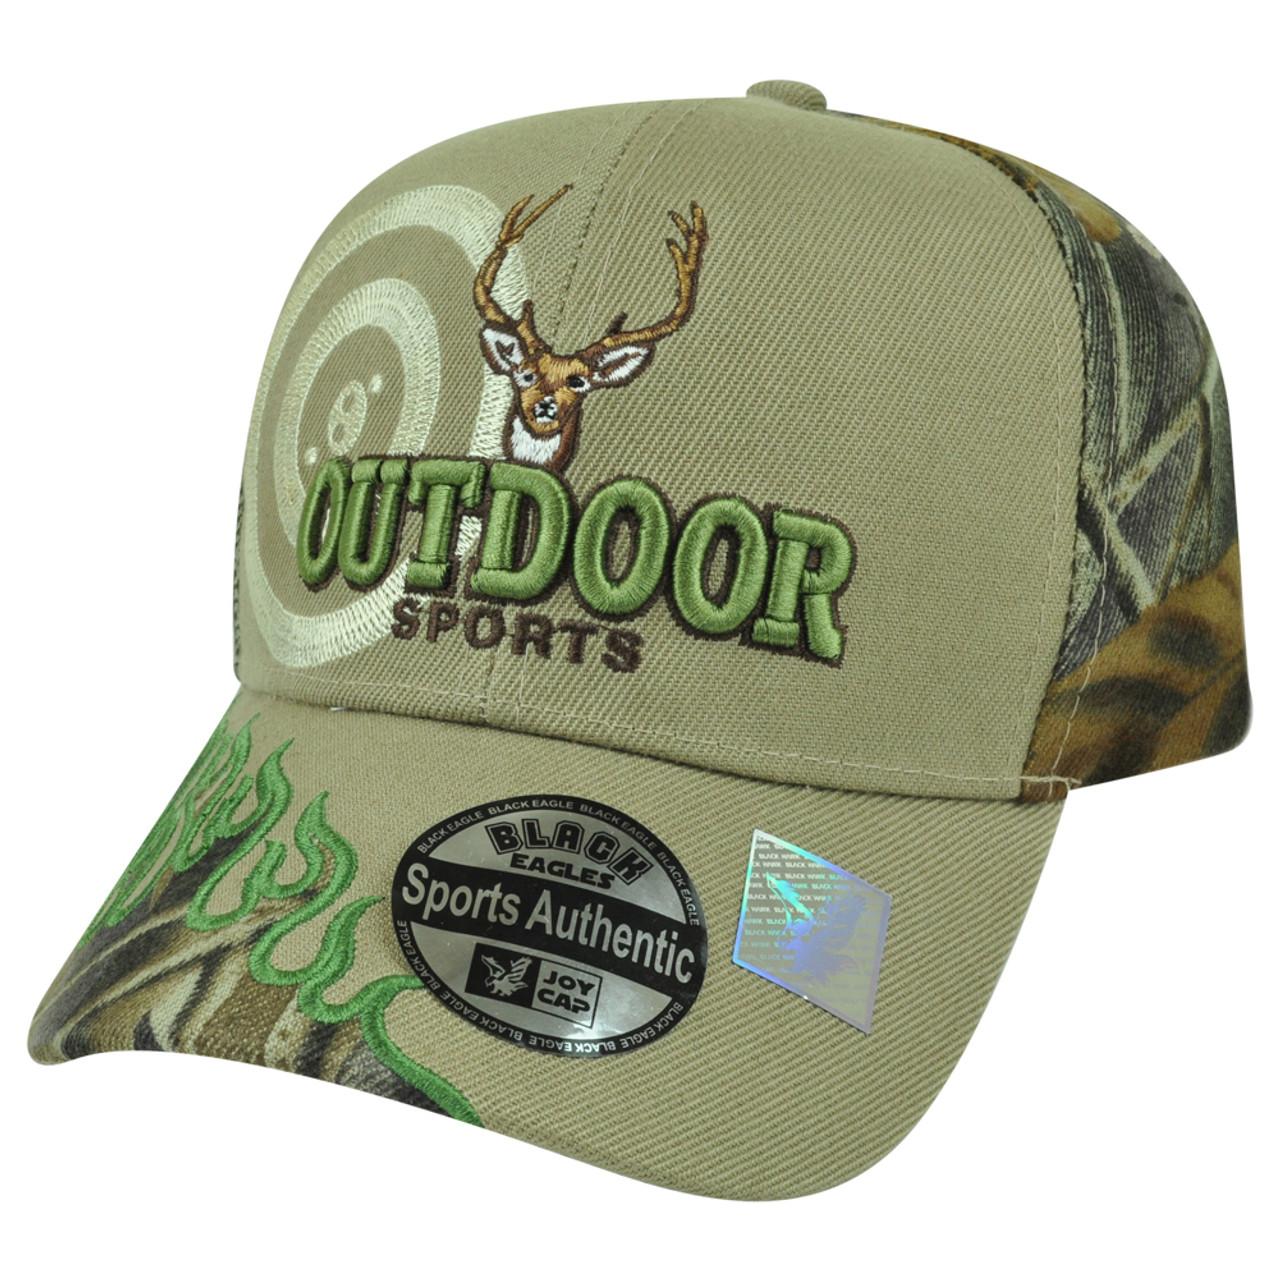 7d30733b Outdoor Sports Deer Hunting Hunt Camping Camp Flame Camouflage Camo Hat Cap  Beige - Cap Store Online.com